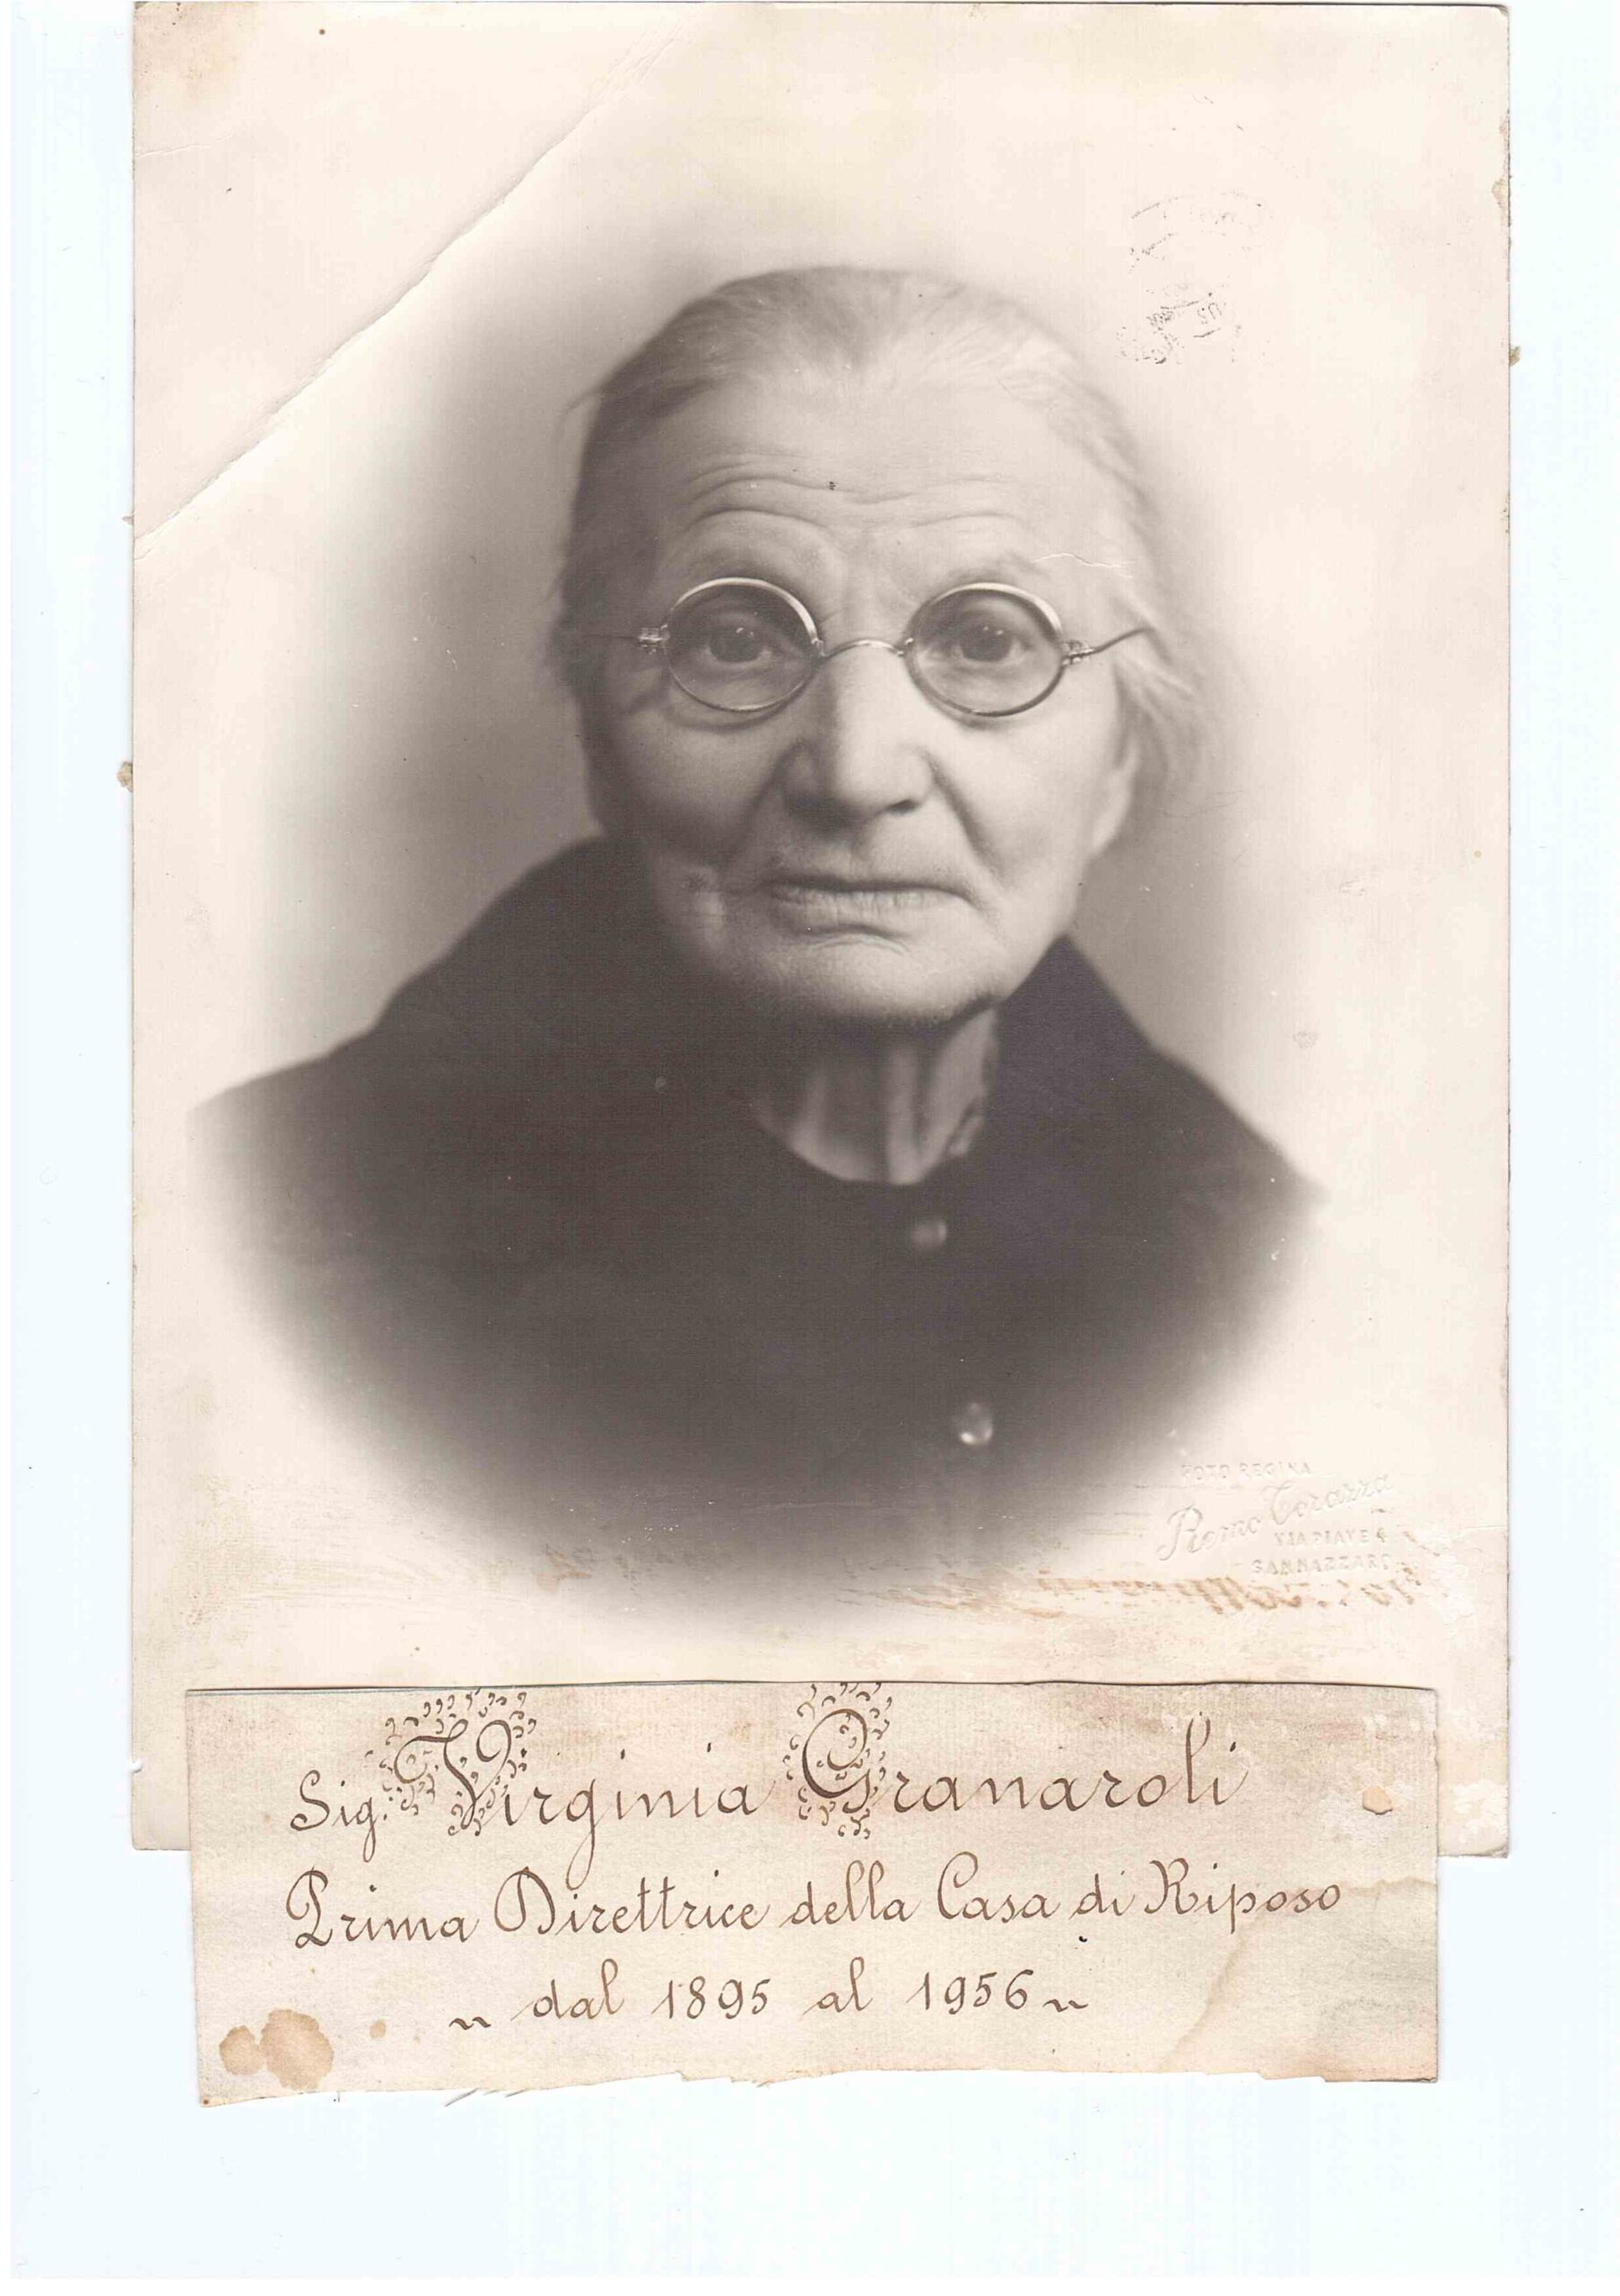 Virginia Granaroli